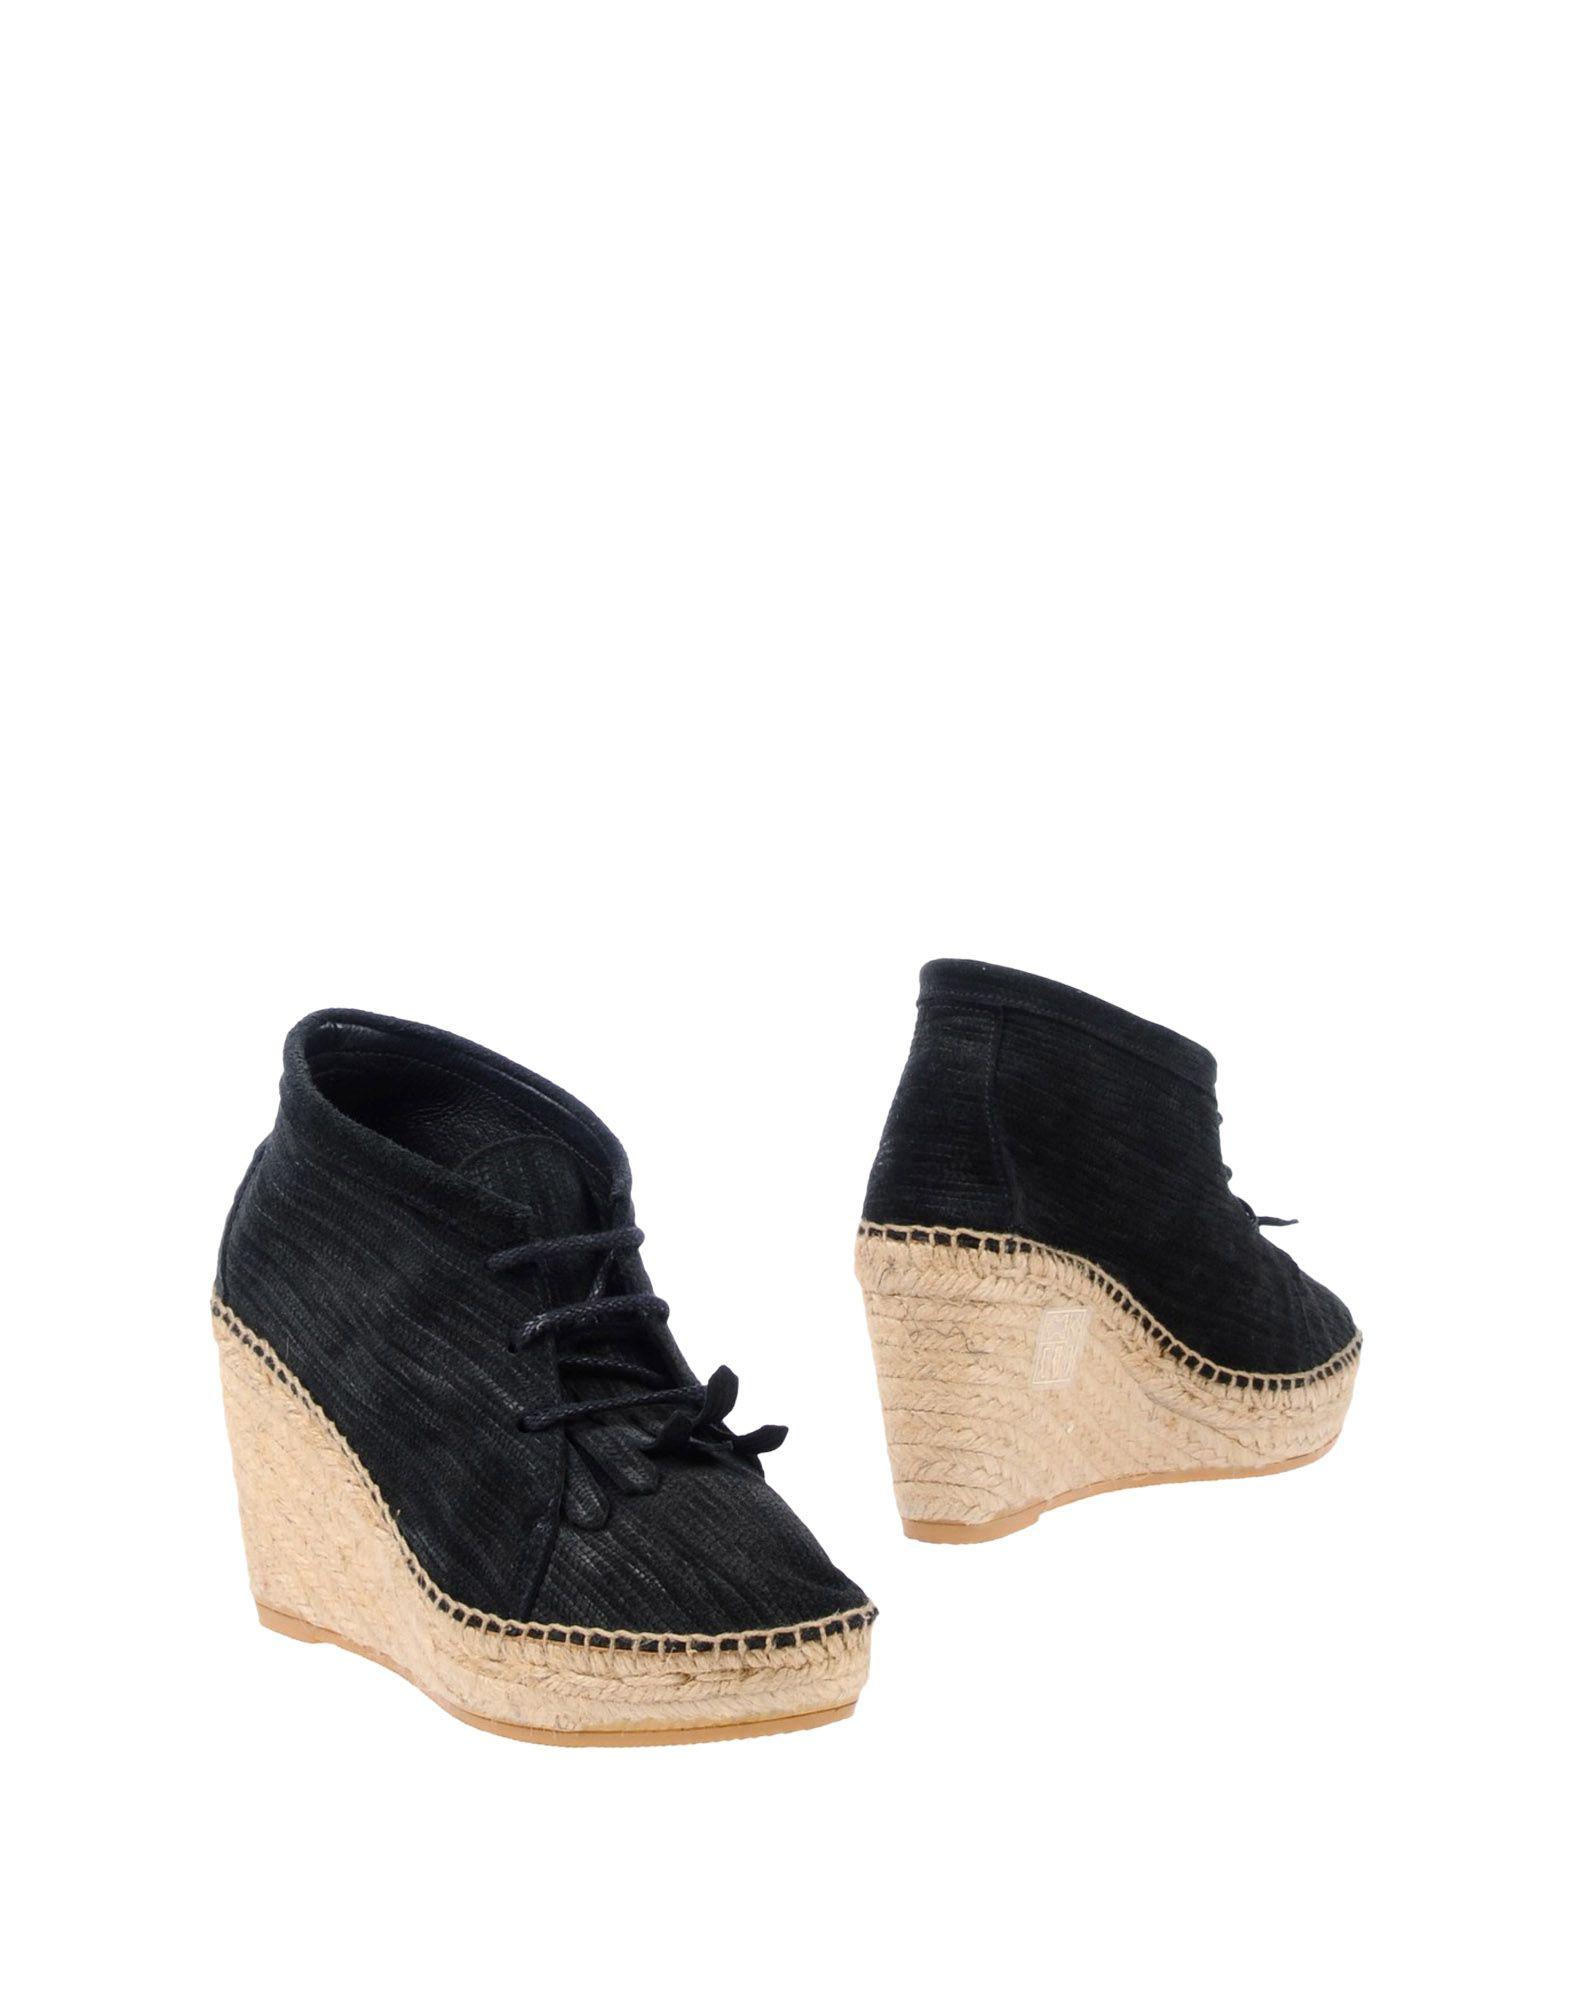 Naguisa Stiefelette Damen  11414089AM Gute Qualität beliebte Schuhe